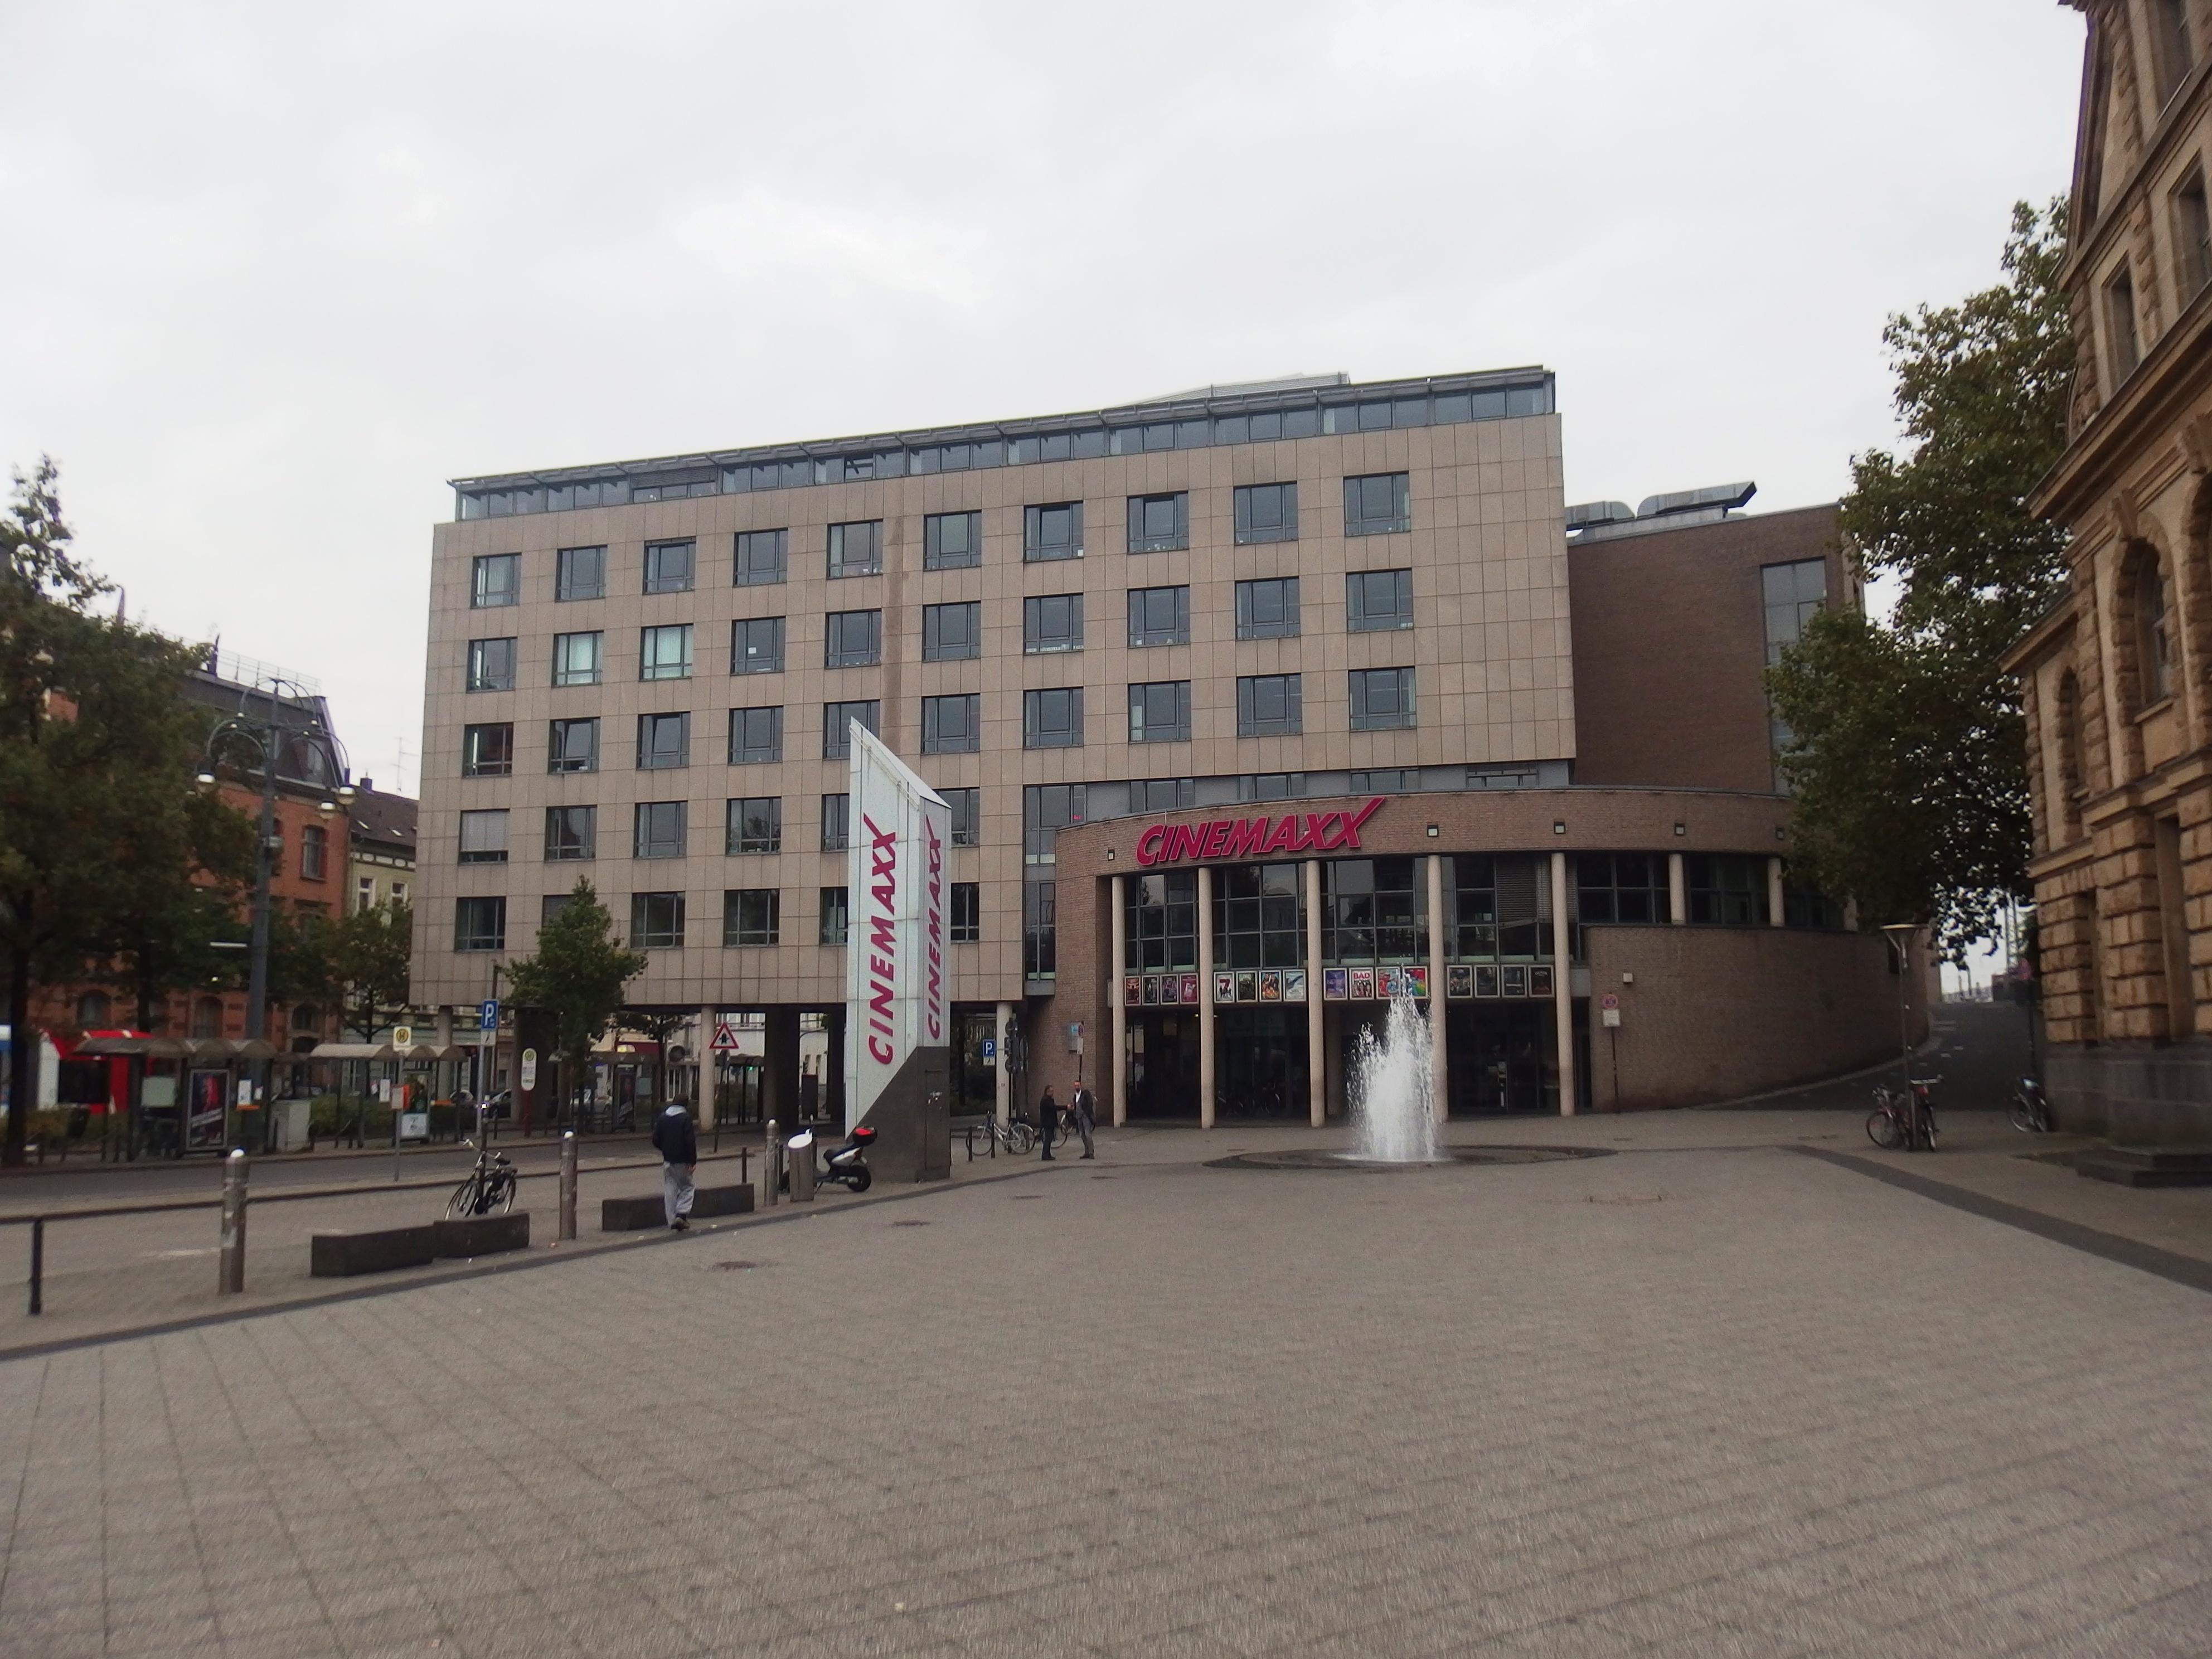 Cinemaxx Krefeld Programm